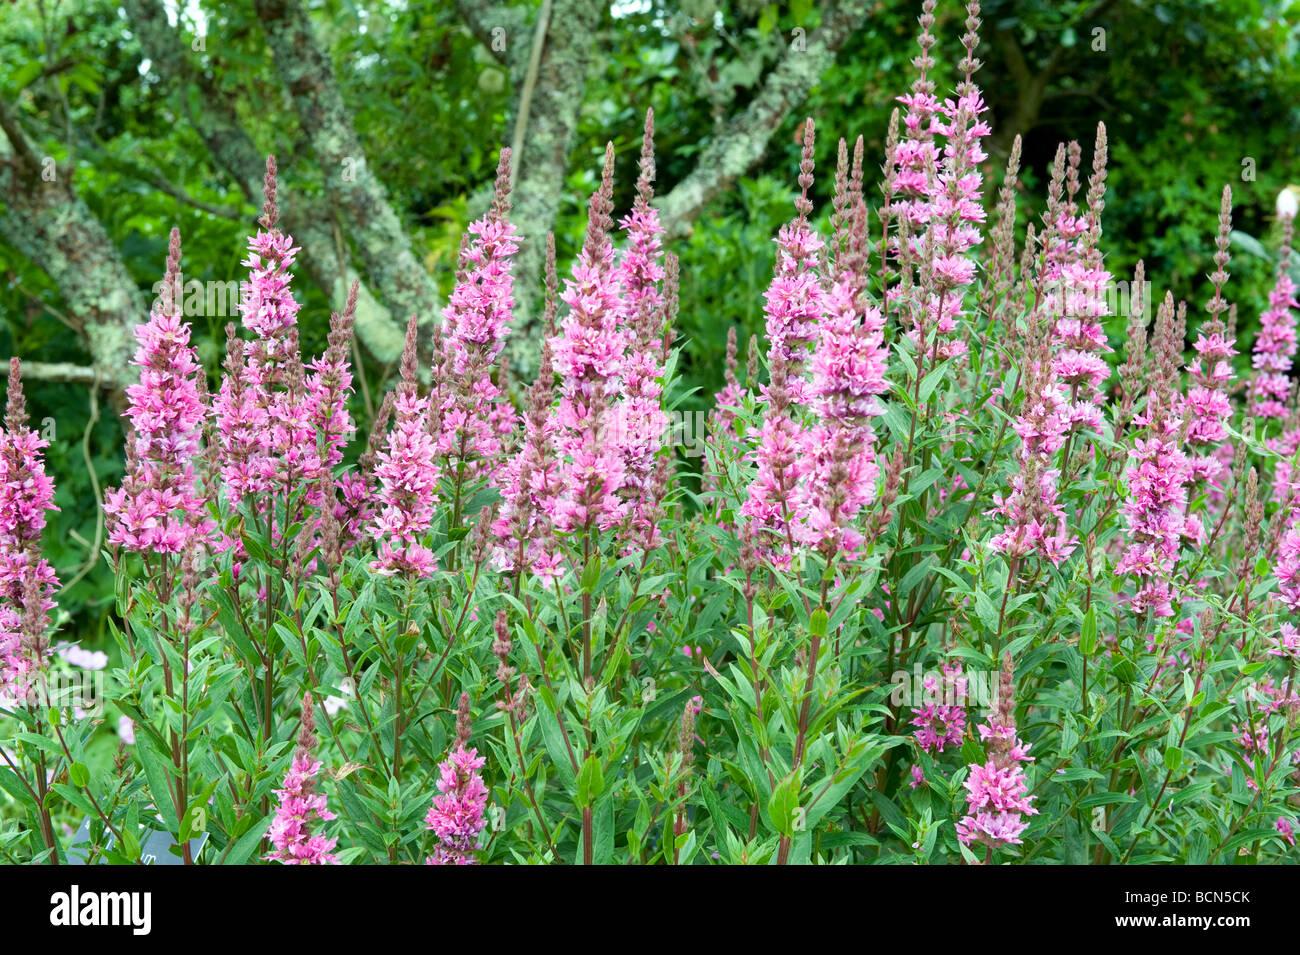 Scrophulariaceae Penstemon Versuvius A Very Pretty Scene Of Pink